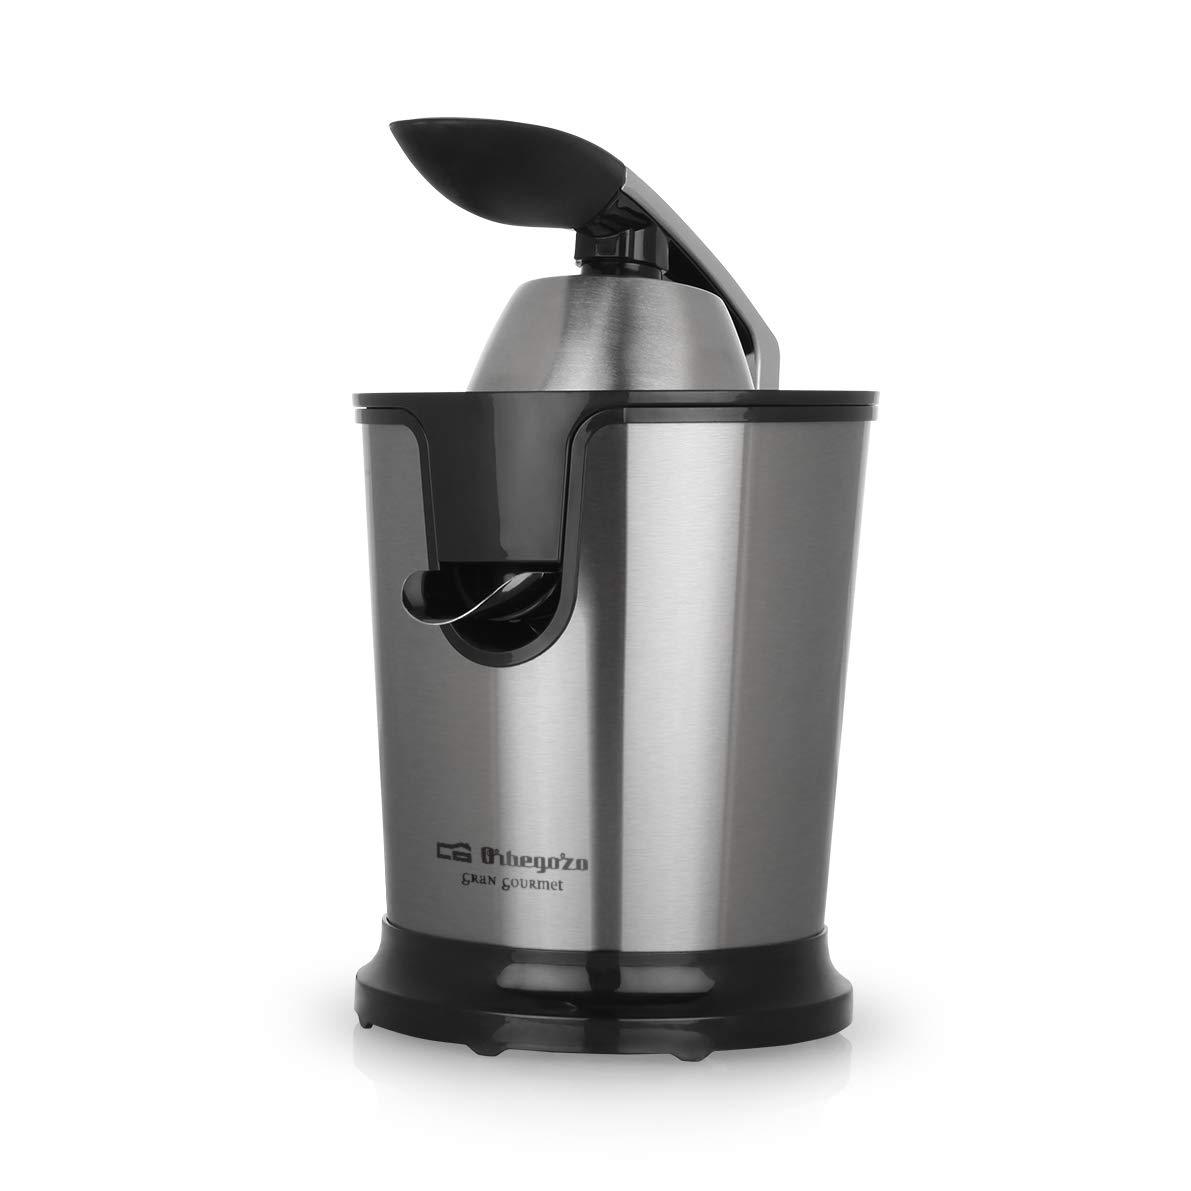 Orbegozo EP 4200 - Exprimidor zumo eléctrico de naranjas con brazo articulado, acero inoxidable, 160 W de potencia, sistema antigoteo: Orbegozo: Amazon.es: Hogar